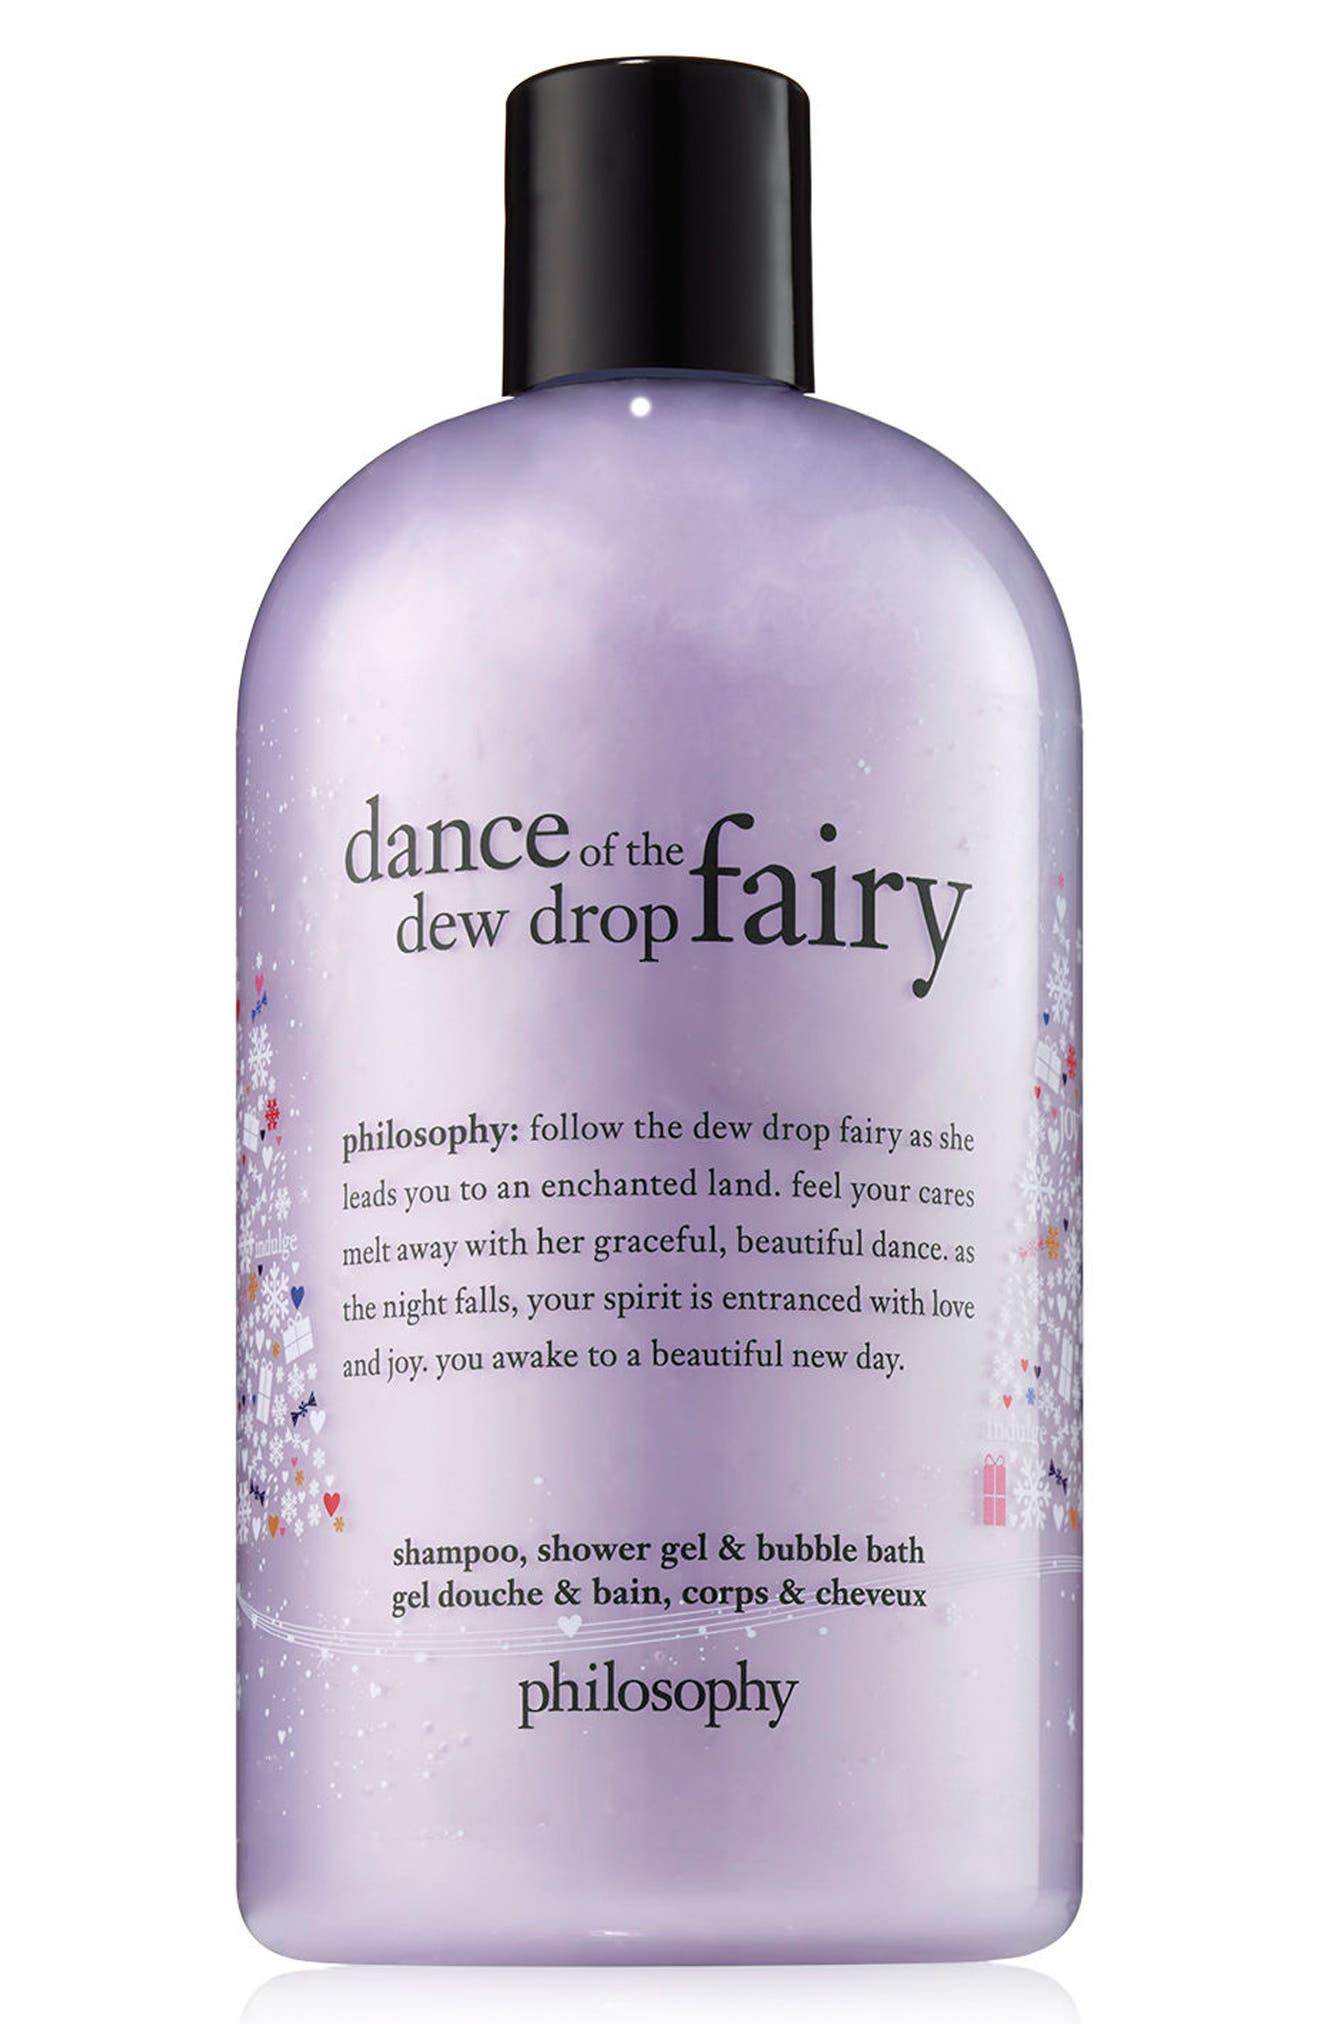 Image of philosophy dance of the dewdrop fairy shampoo, shower gel & bubble bath